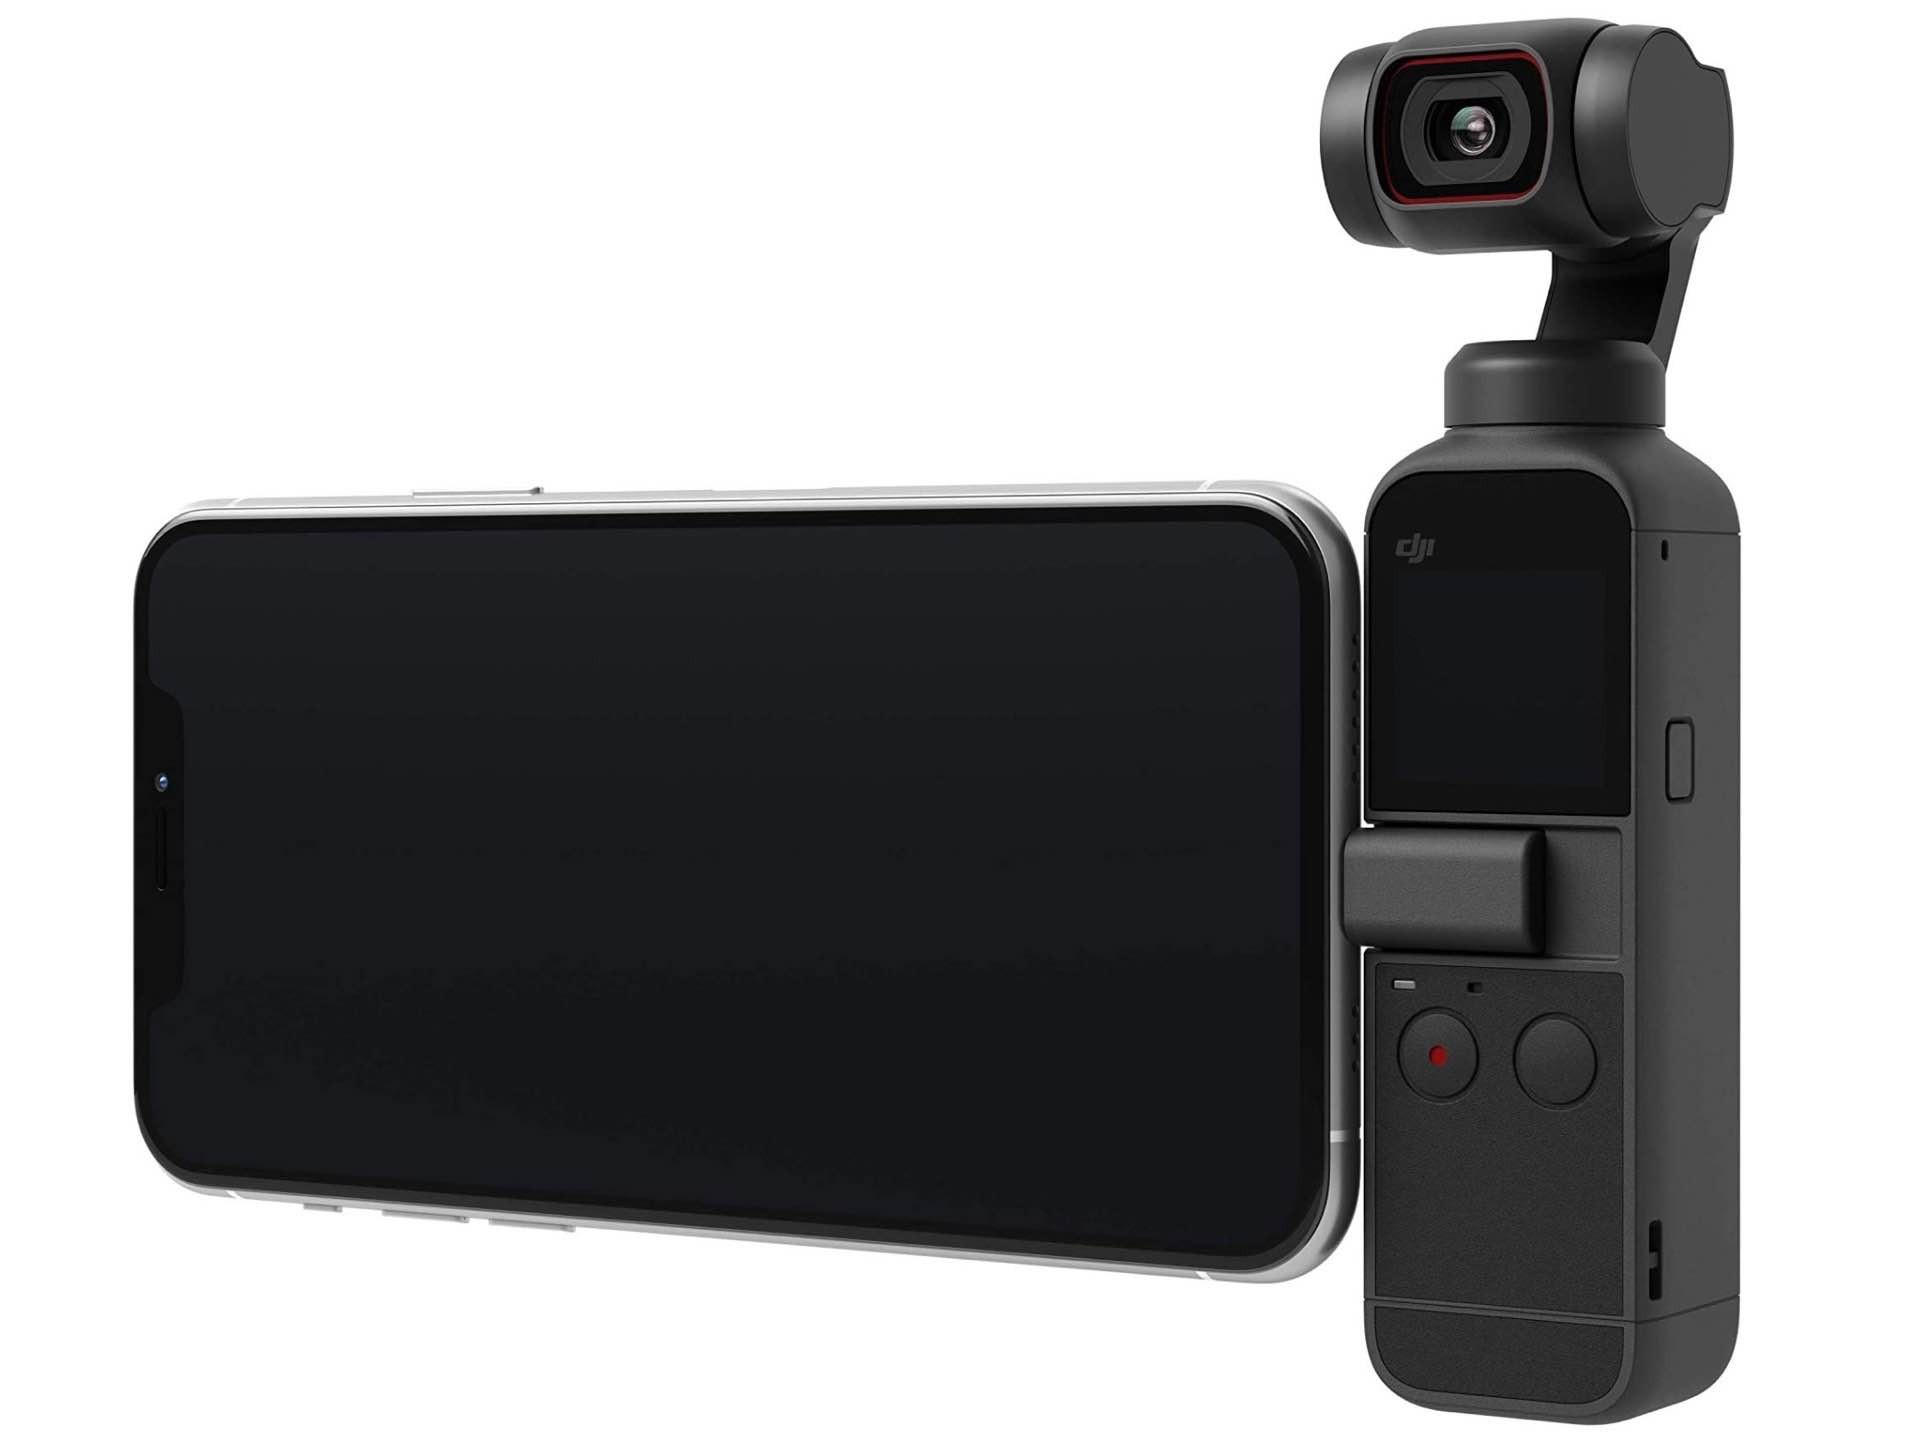 dji-pocket-2-handheld-video-stabilizer-and-camera-3